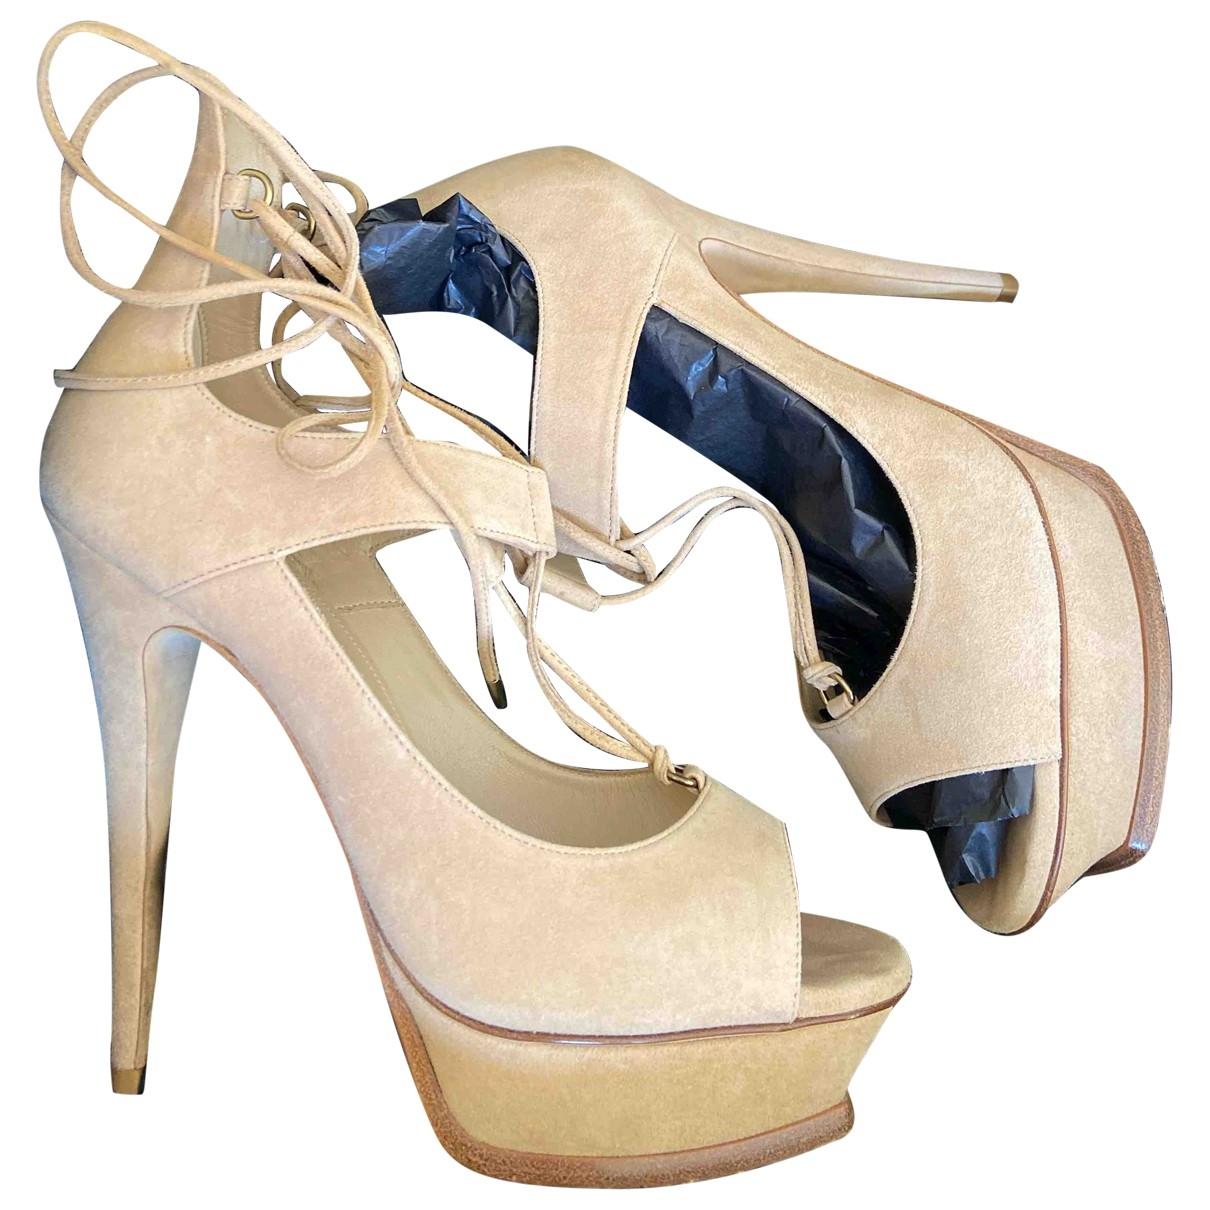 Saint Laurent \N Beige Suede Sandals for Women 39 IT